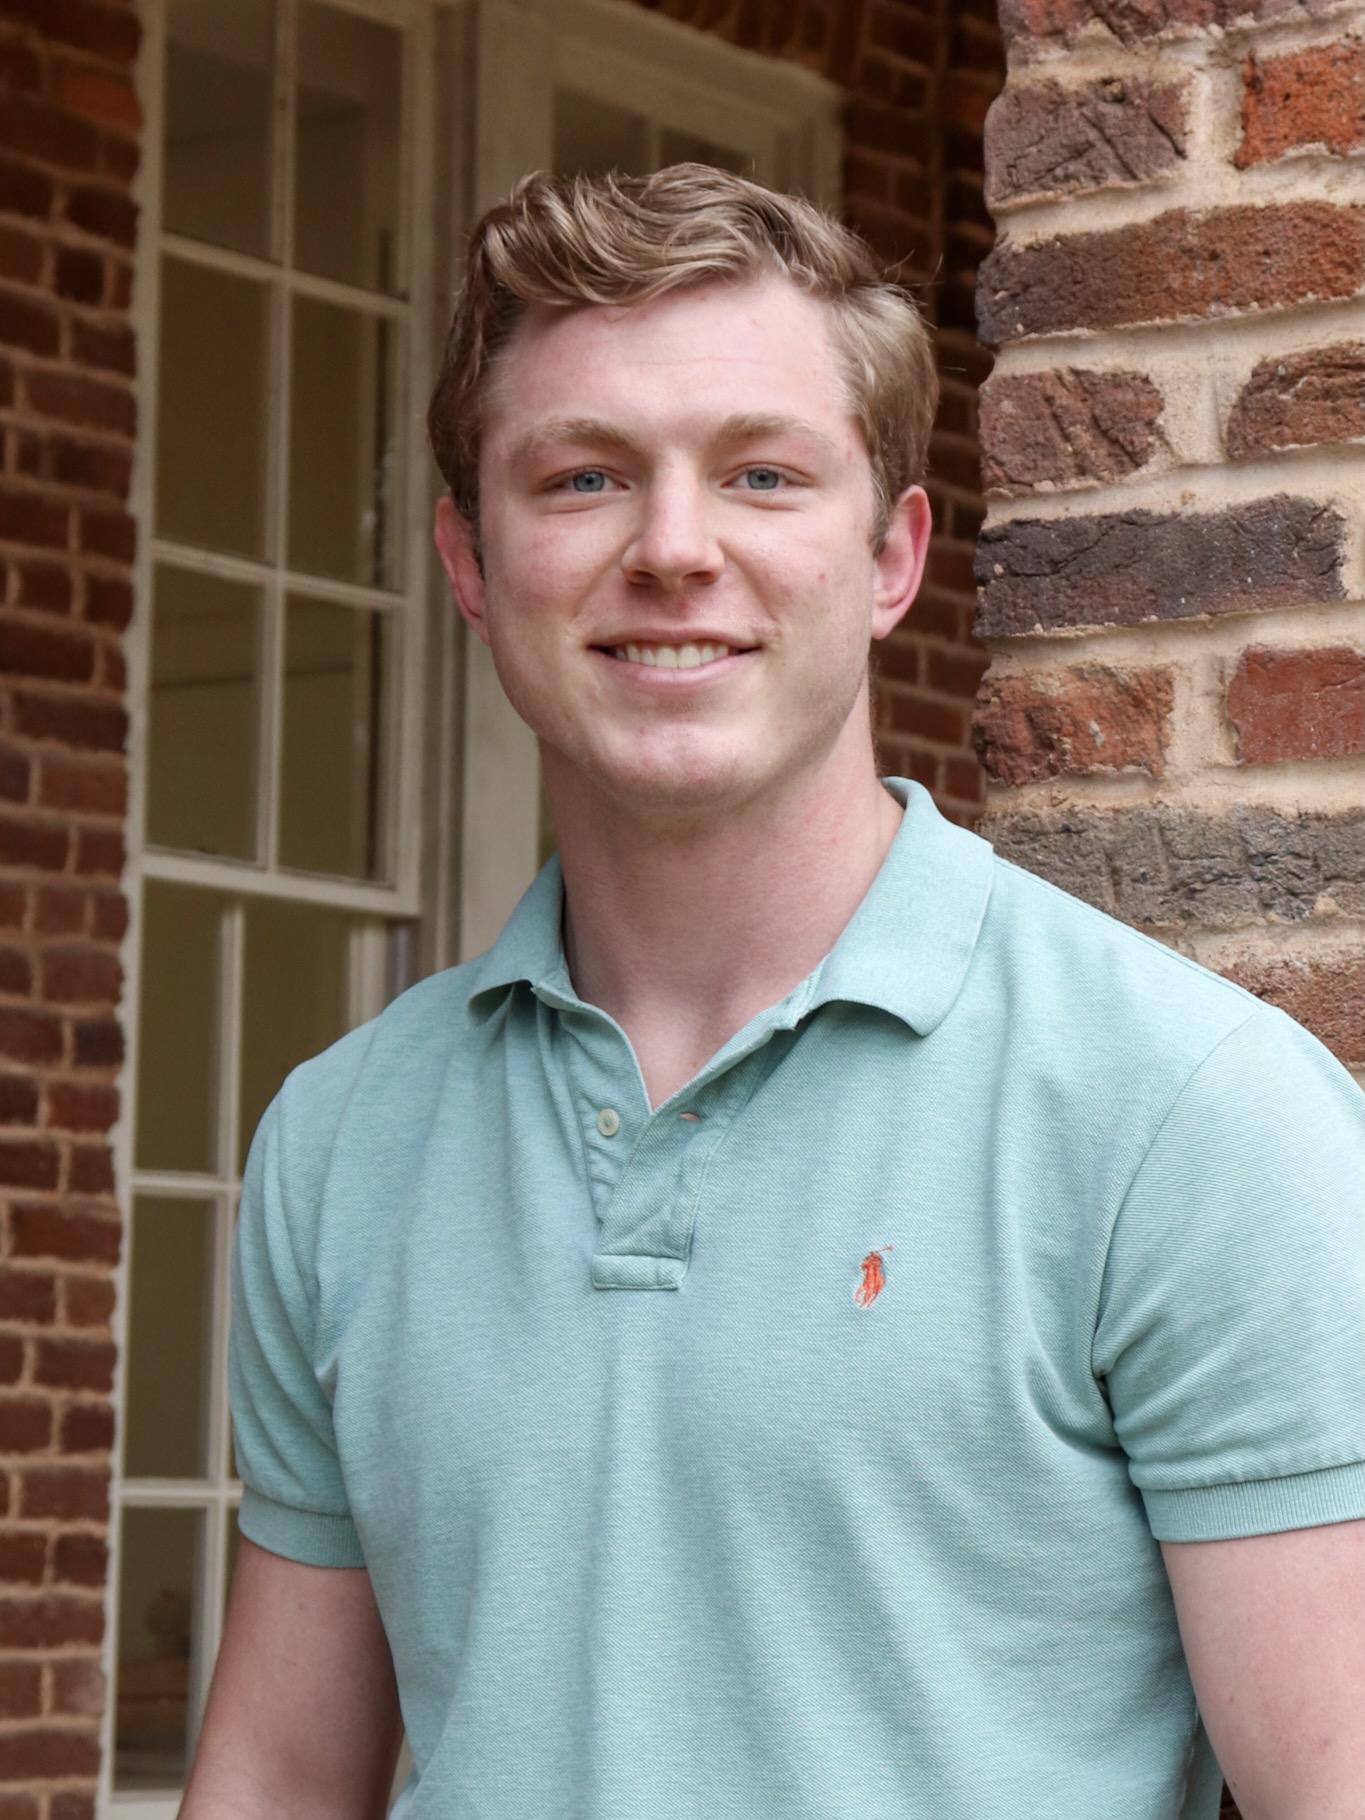 Gavin Venable